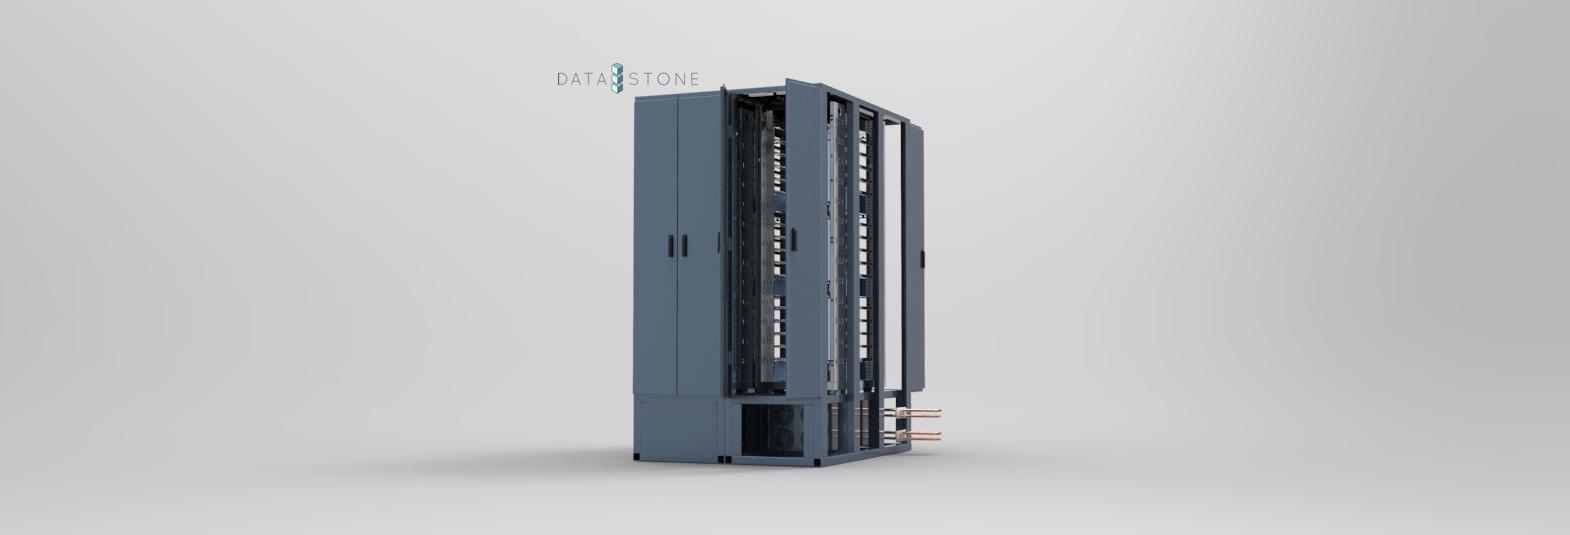 Модульный ЦОД DataStone OpenRack